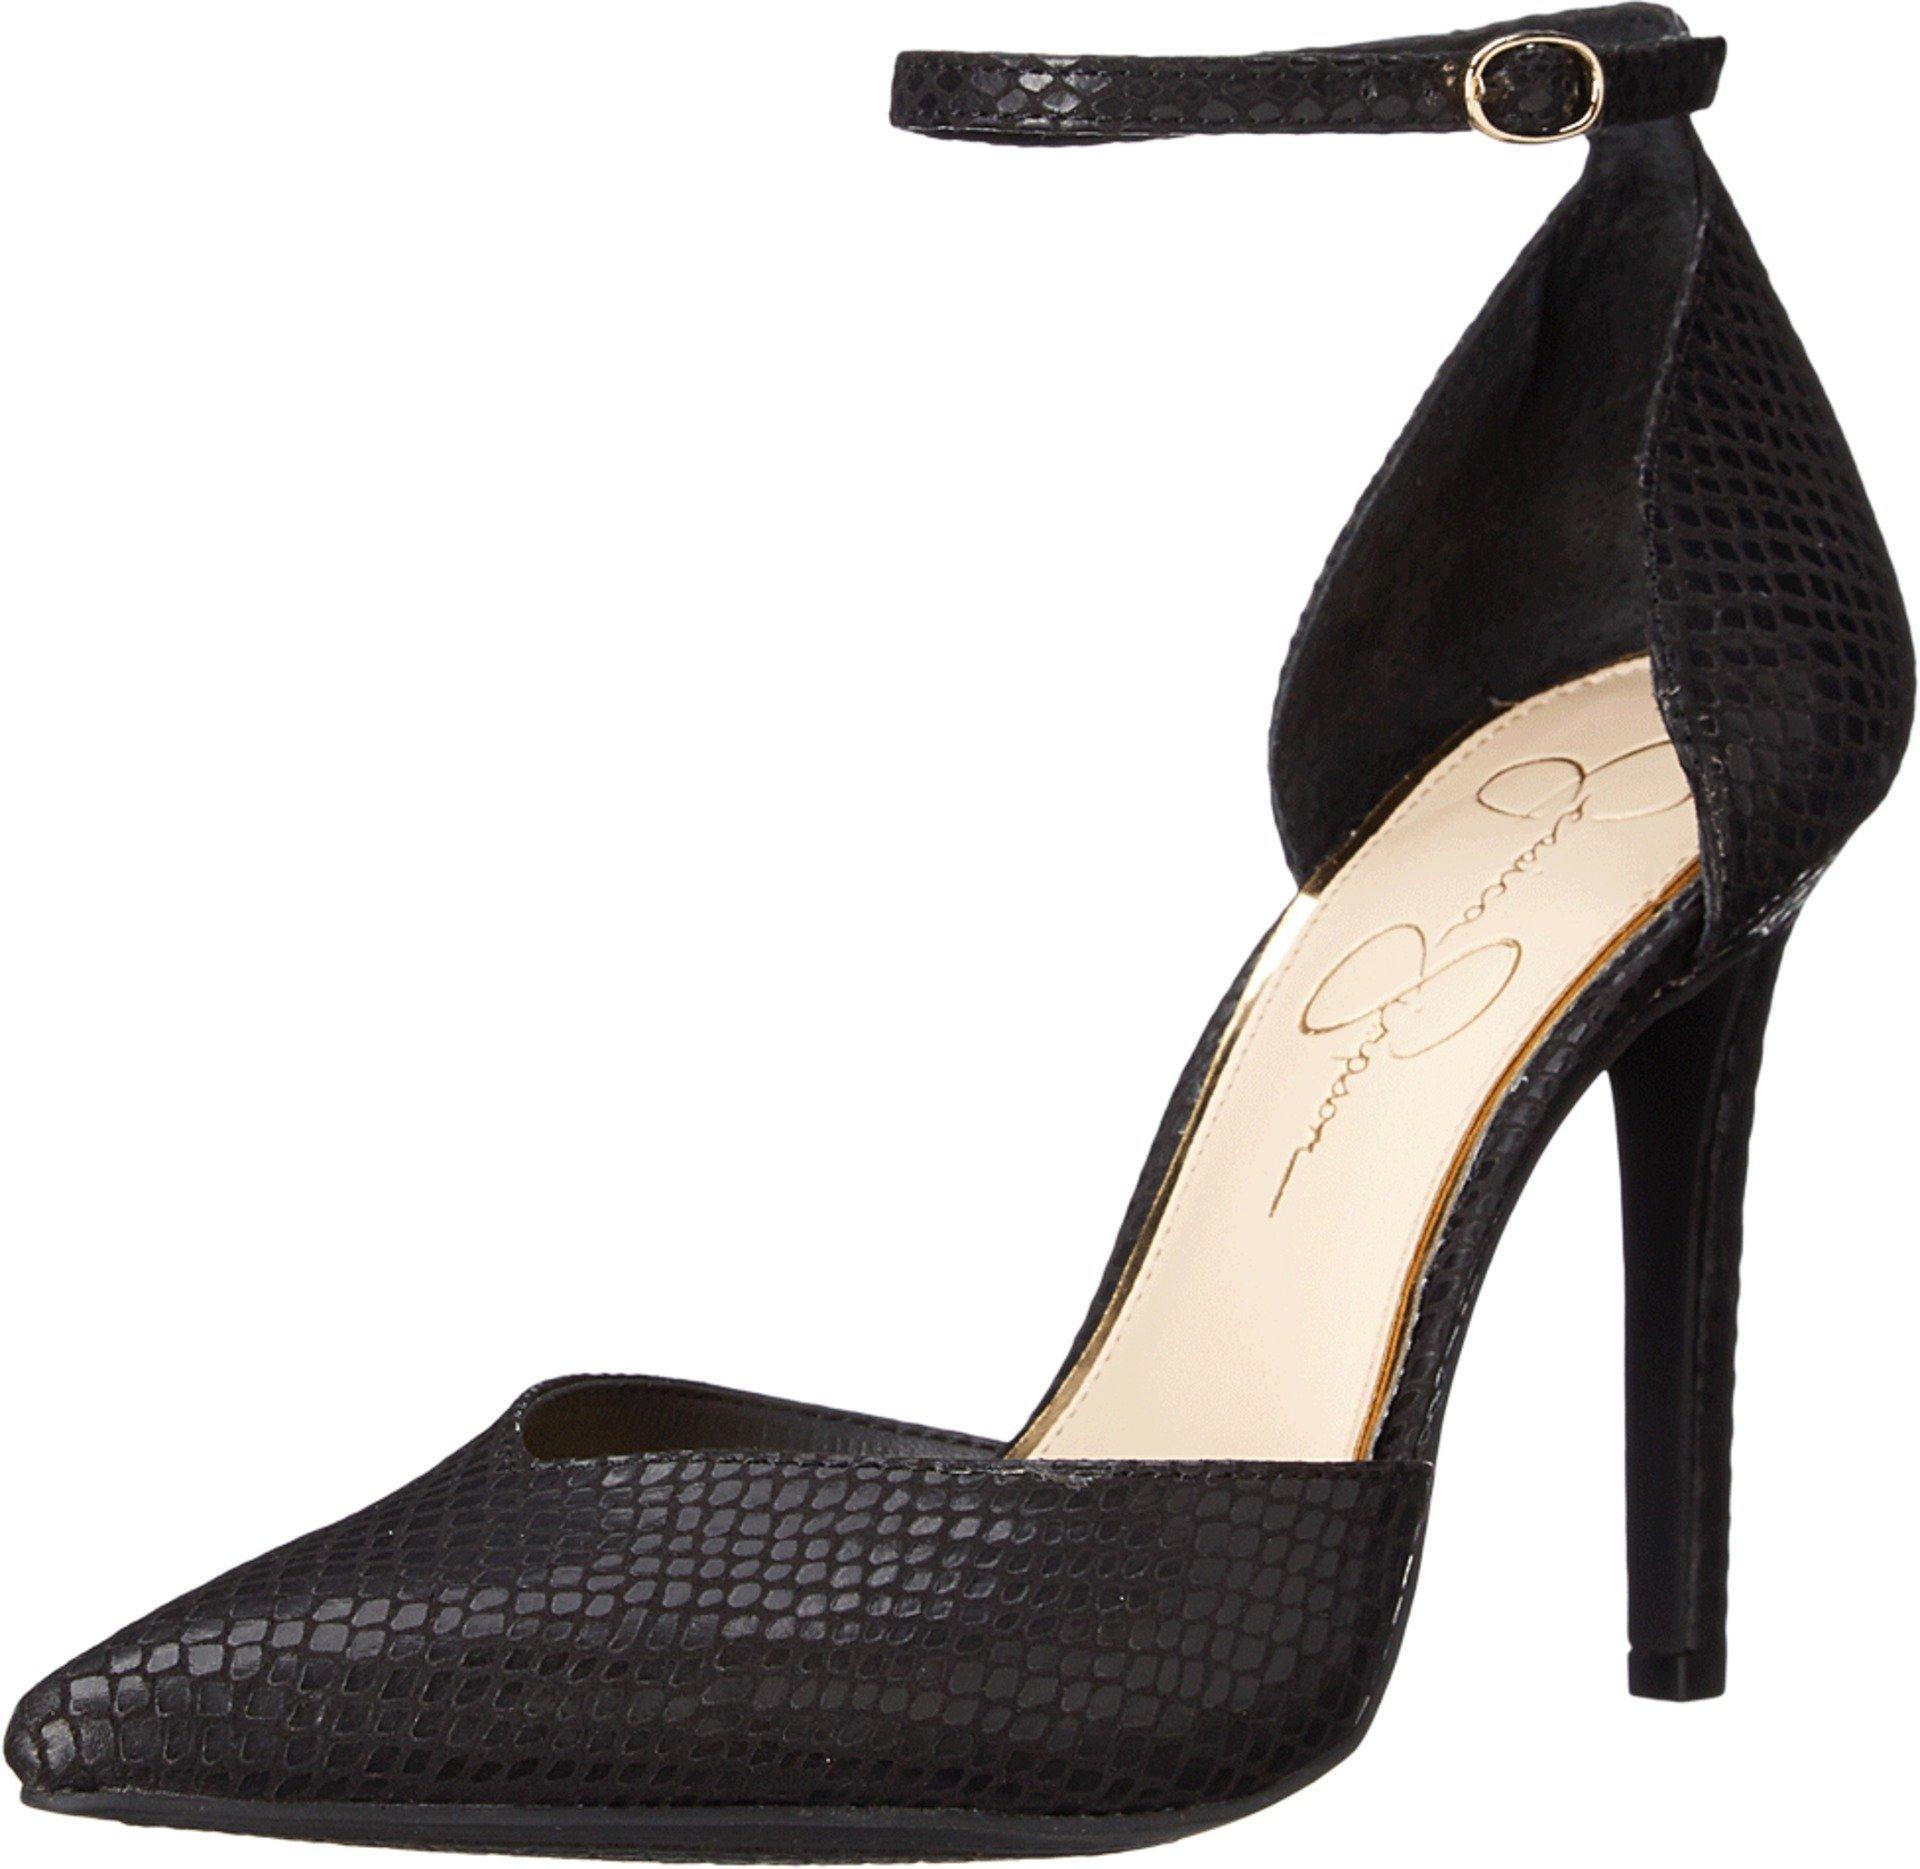 Jessica Simpson Women's Cirrus Dress Pump, Black Snake, 10 M US